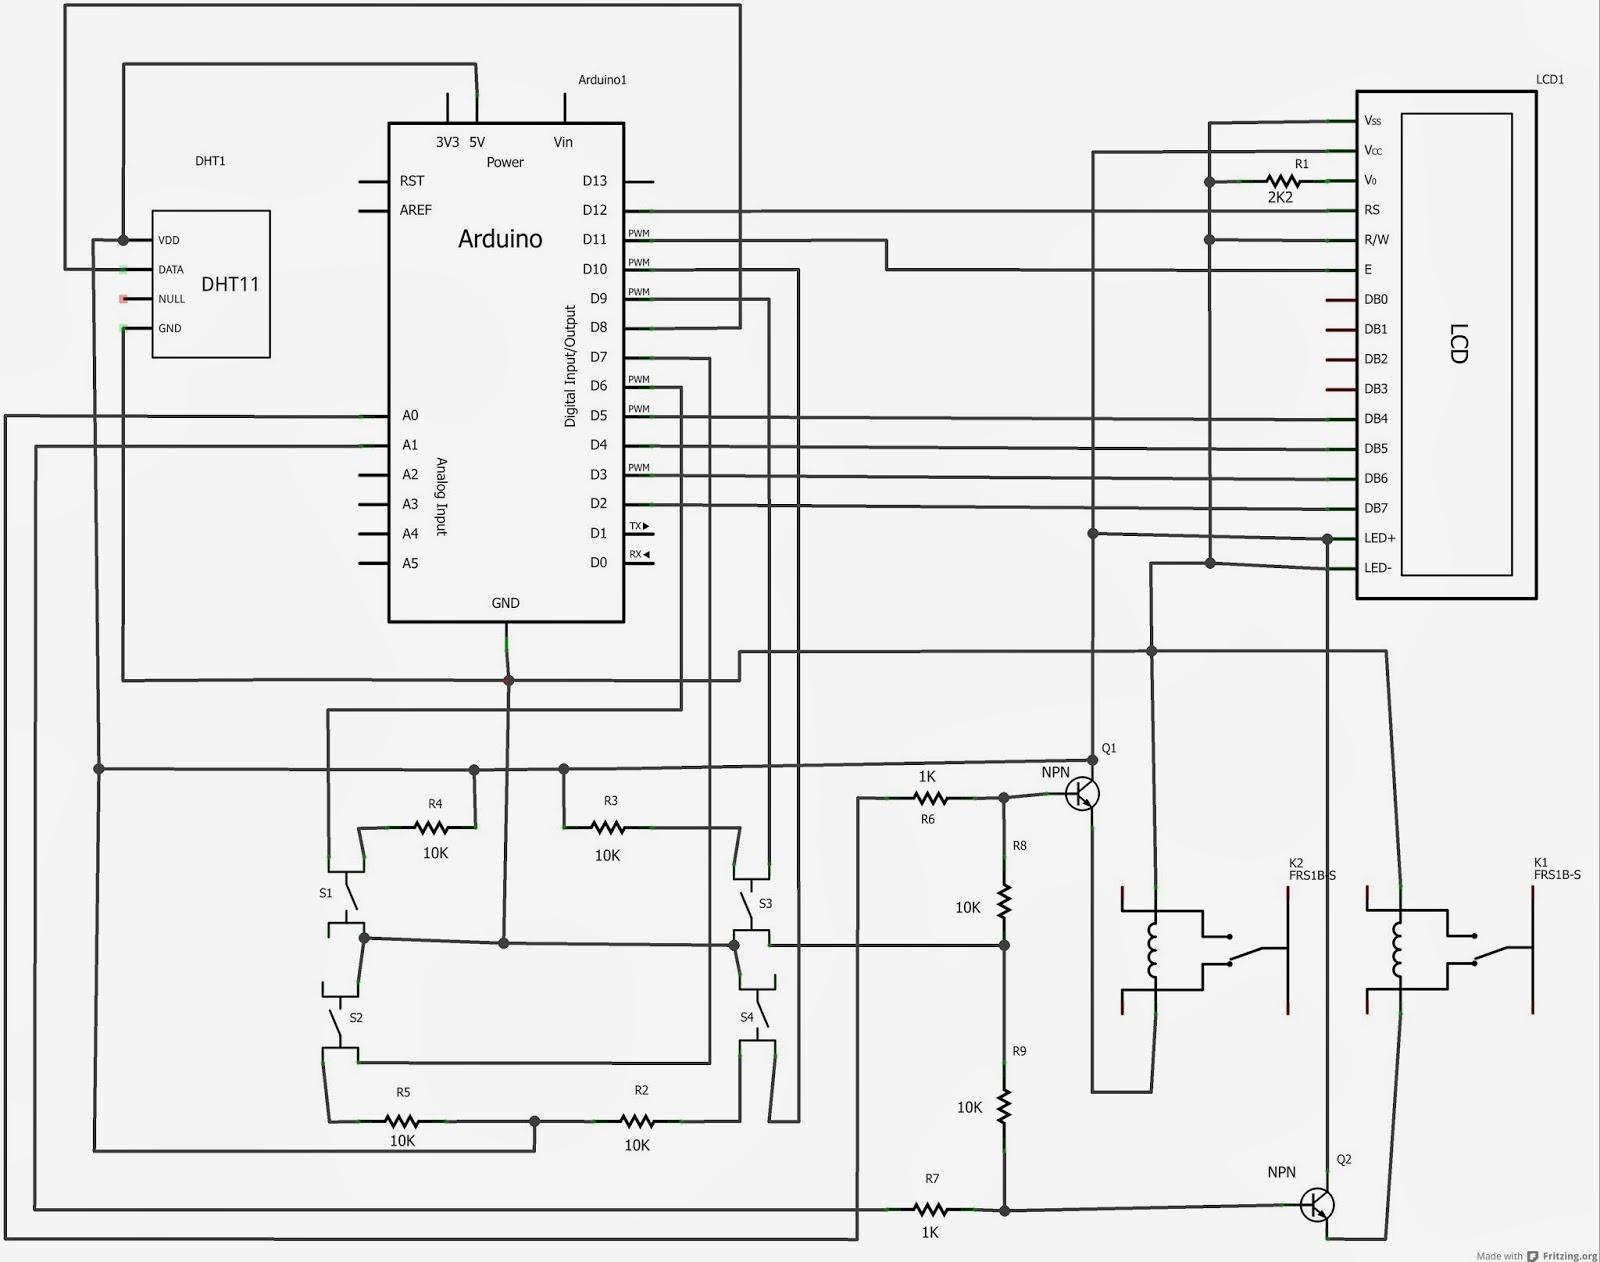 Schemi Elettrici Per Led : Kmz software hardware schemi elettrici